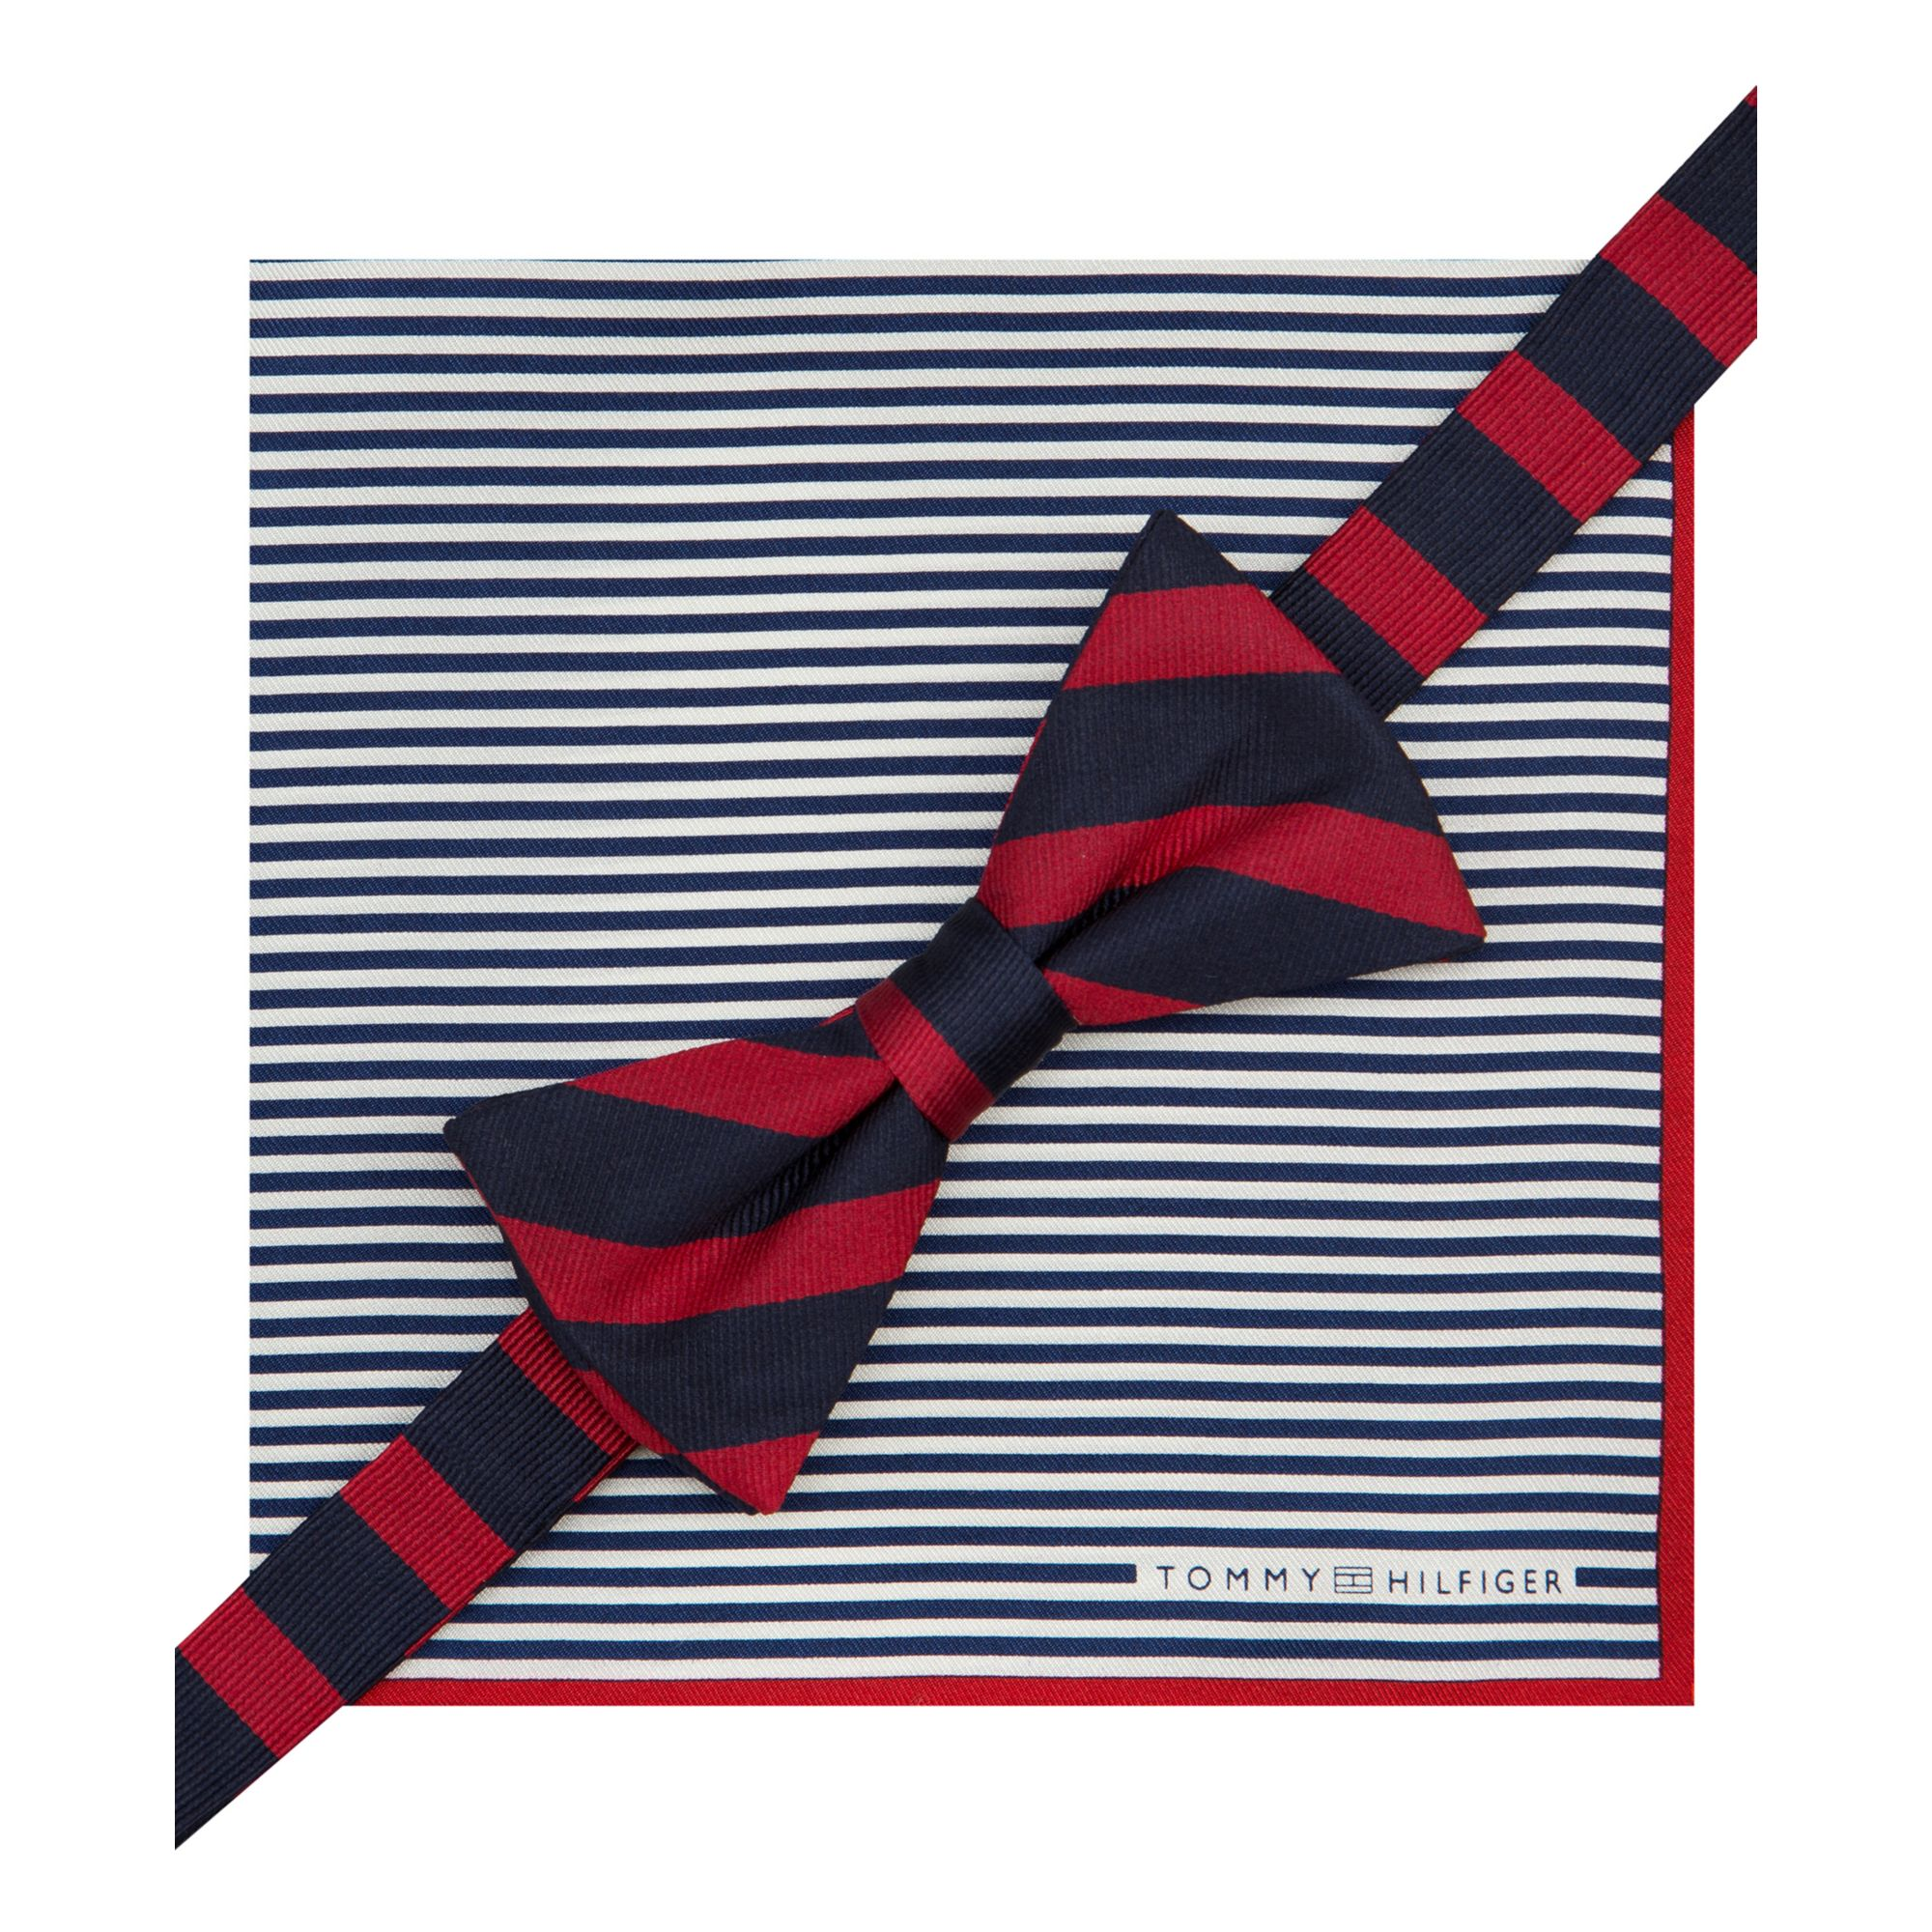 a31ab81a8571 Tommy Hilfiger Stripe Bow Tie Pocket Square Set in Blue for Men - Lyst